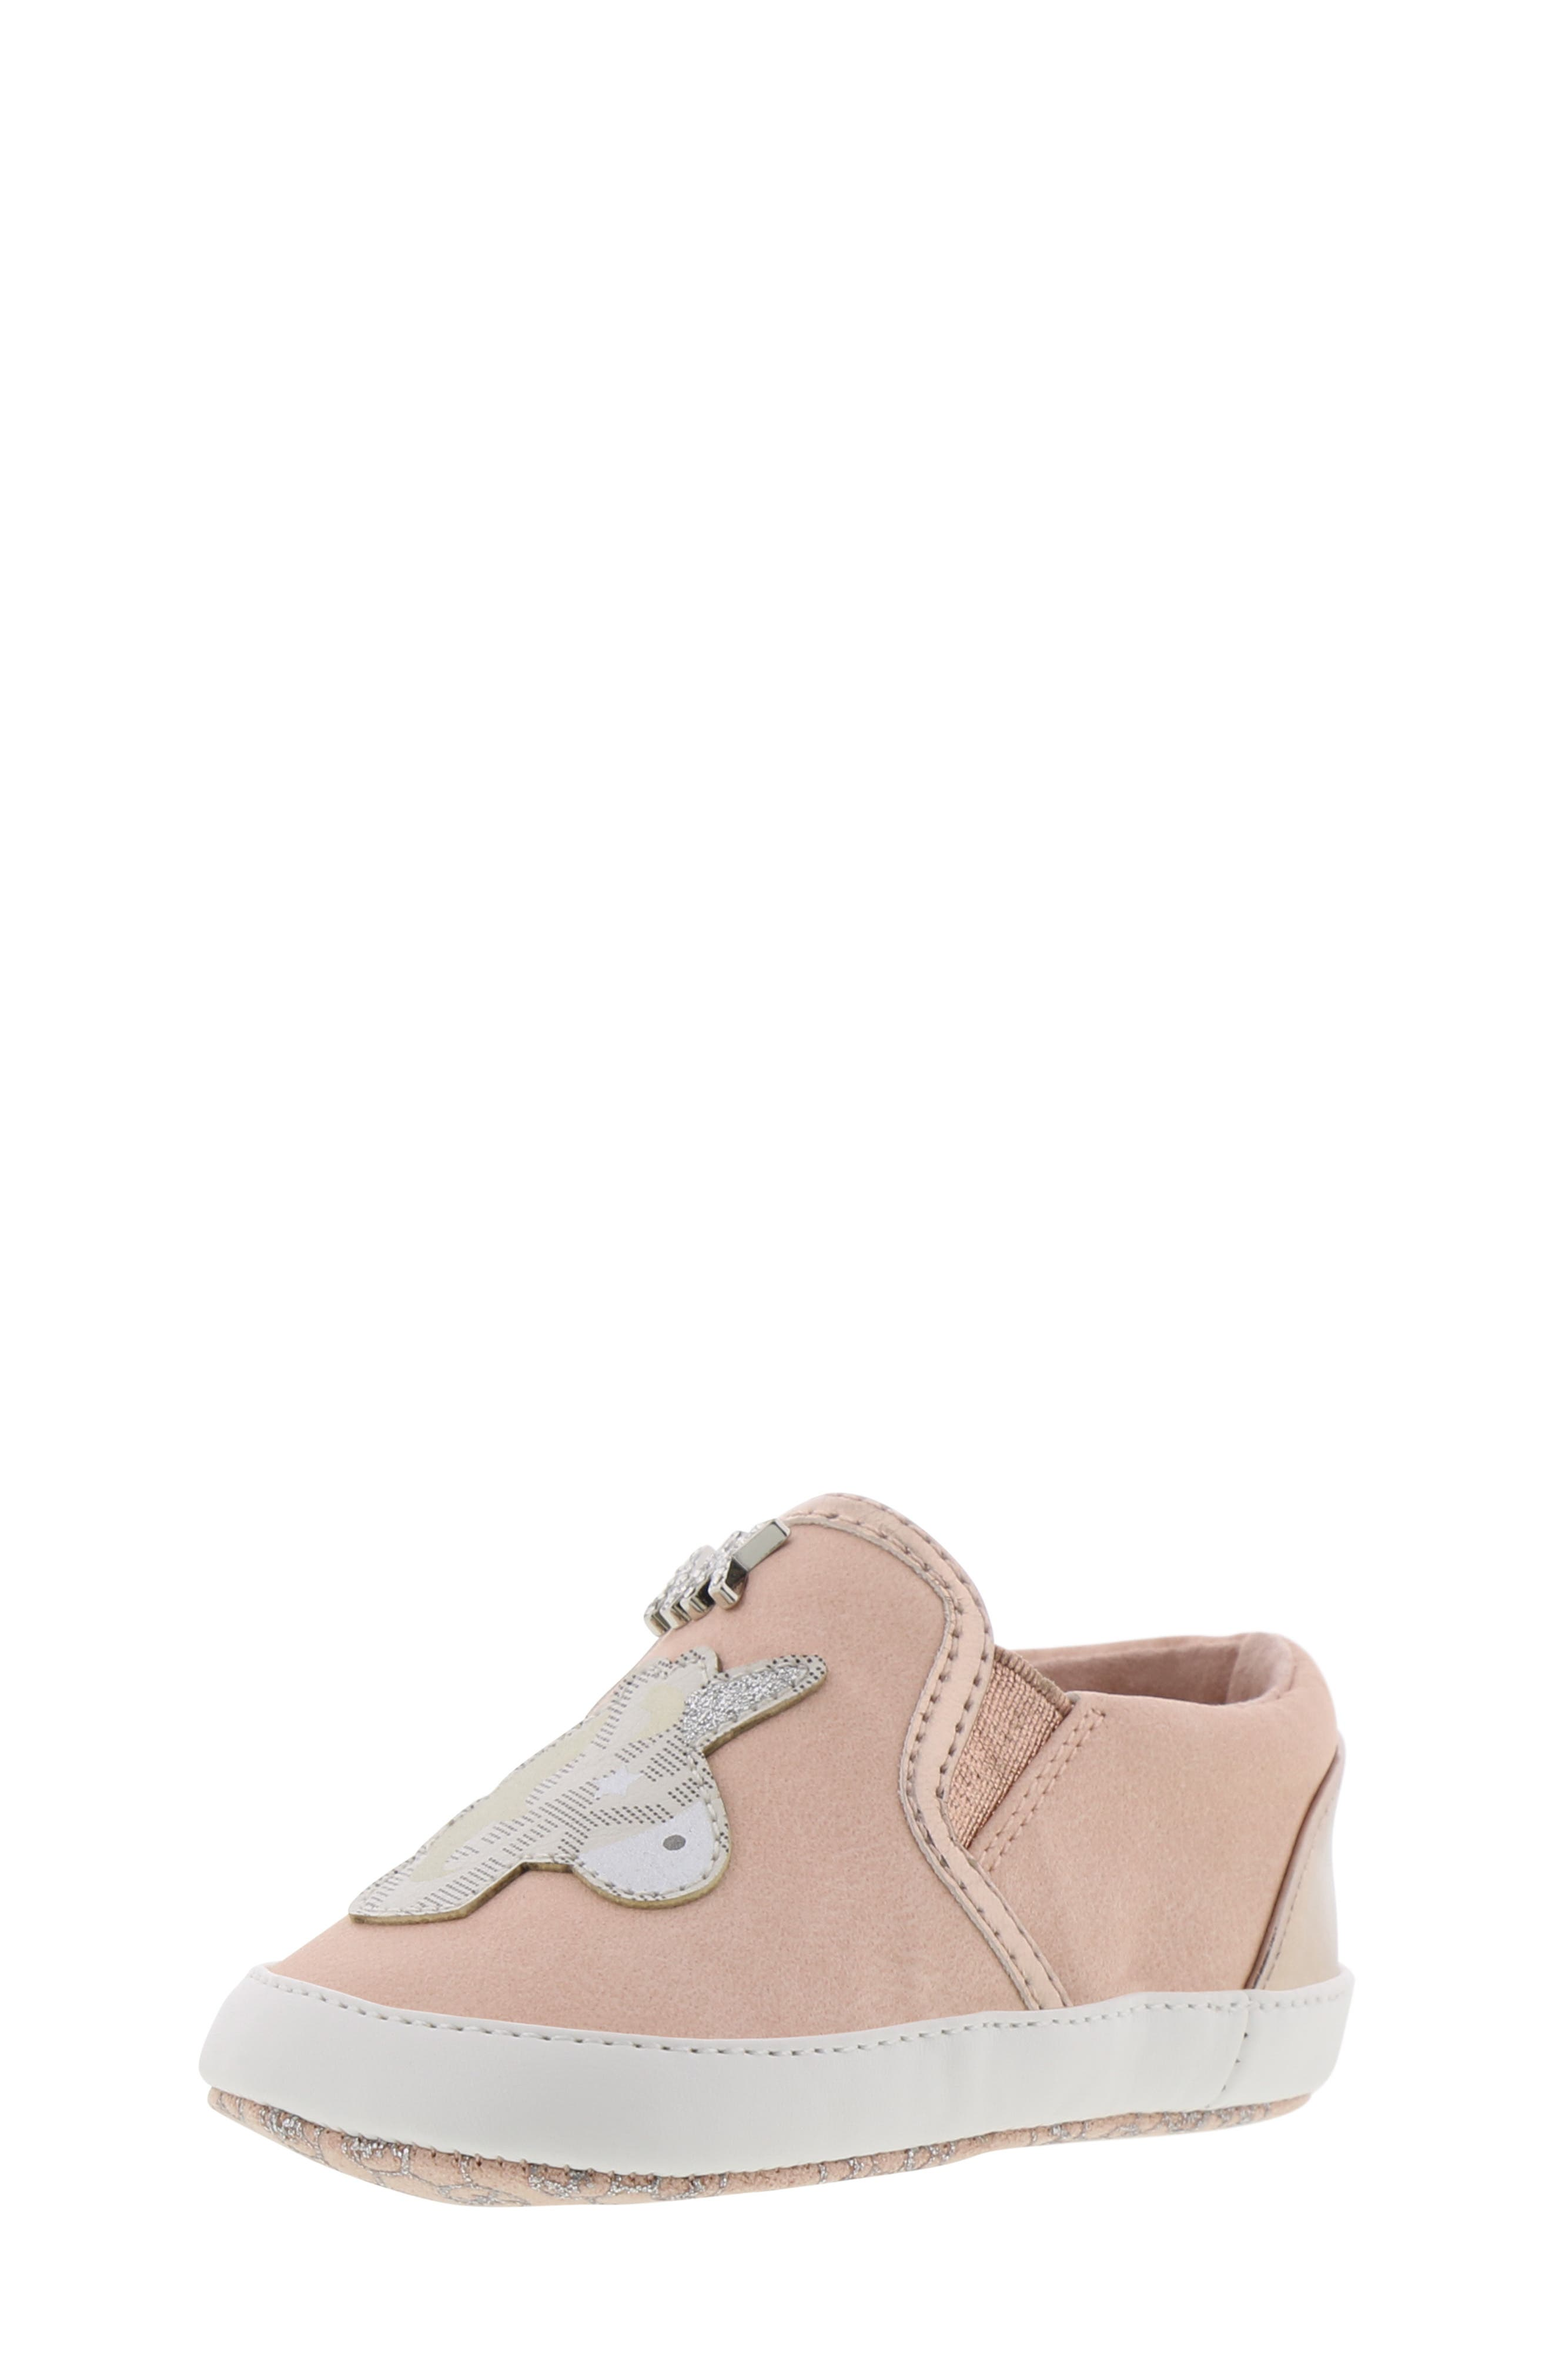 MICHAEL MICHAEL KORS, Magic Slip-On Sneaker, Alternate thumbnail 8, color, BLUSH